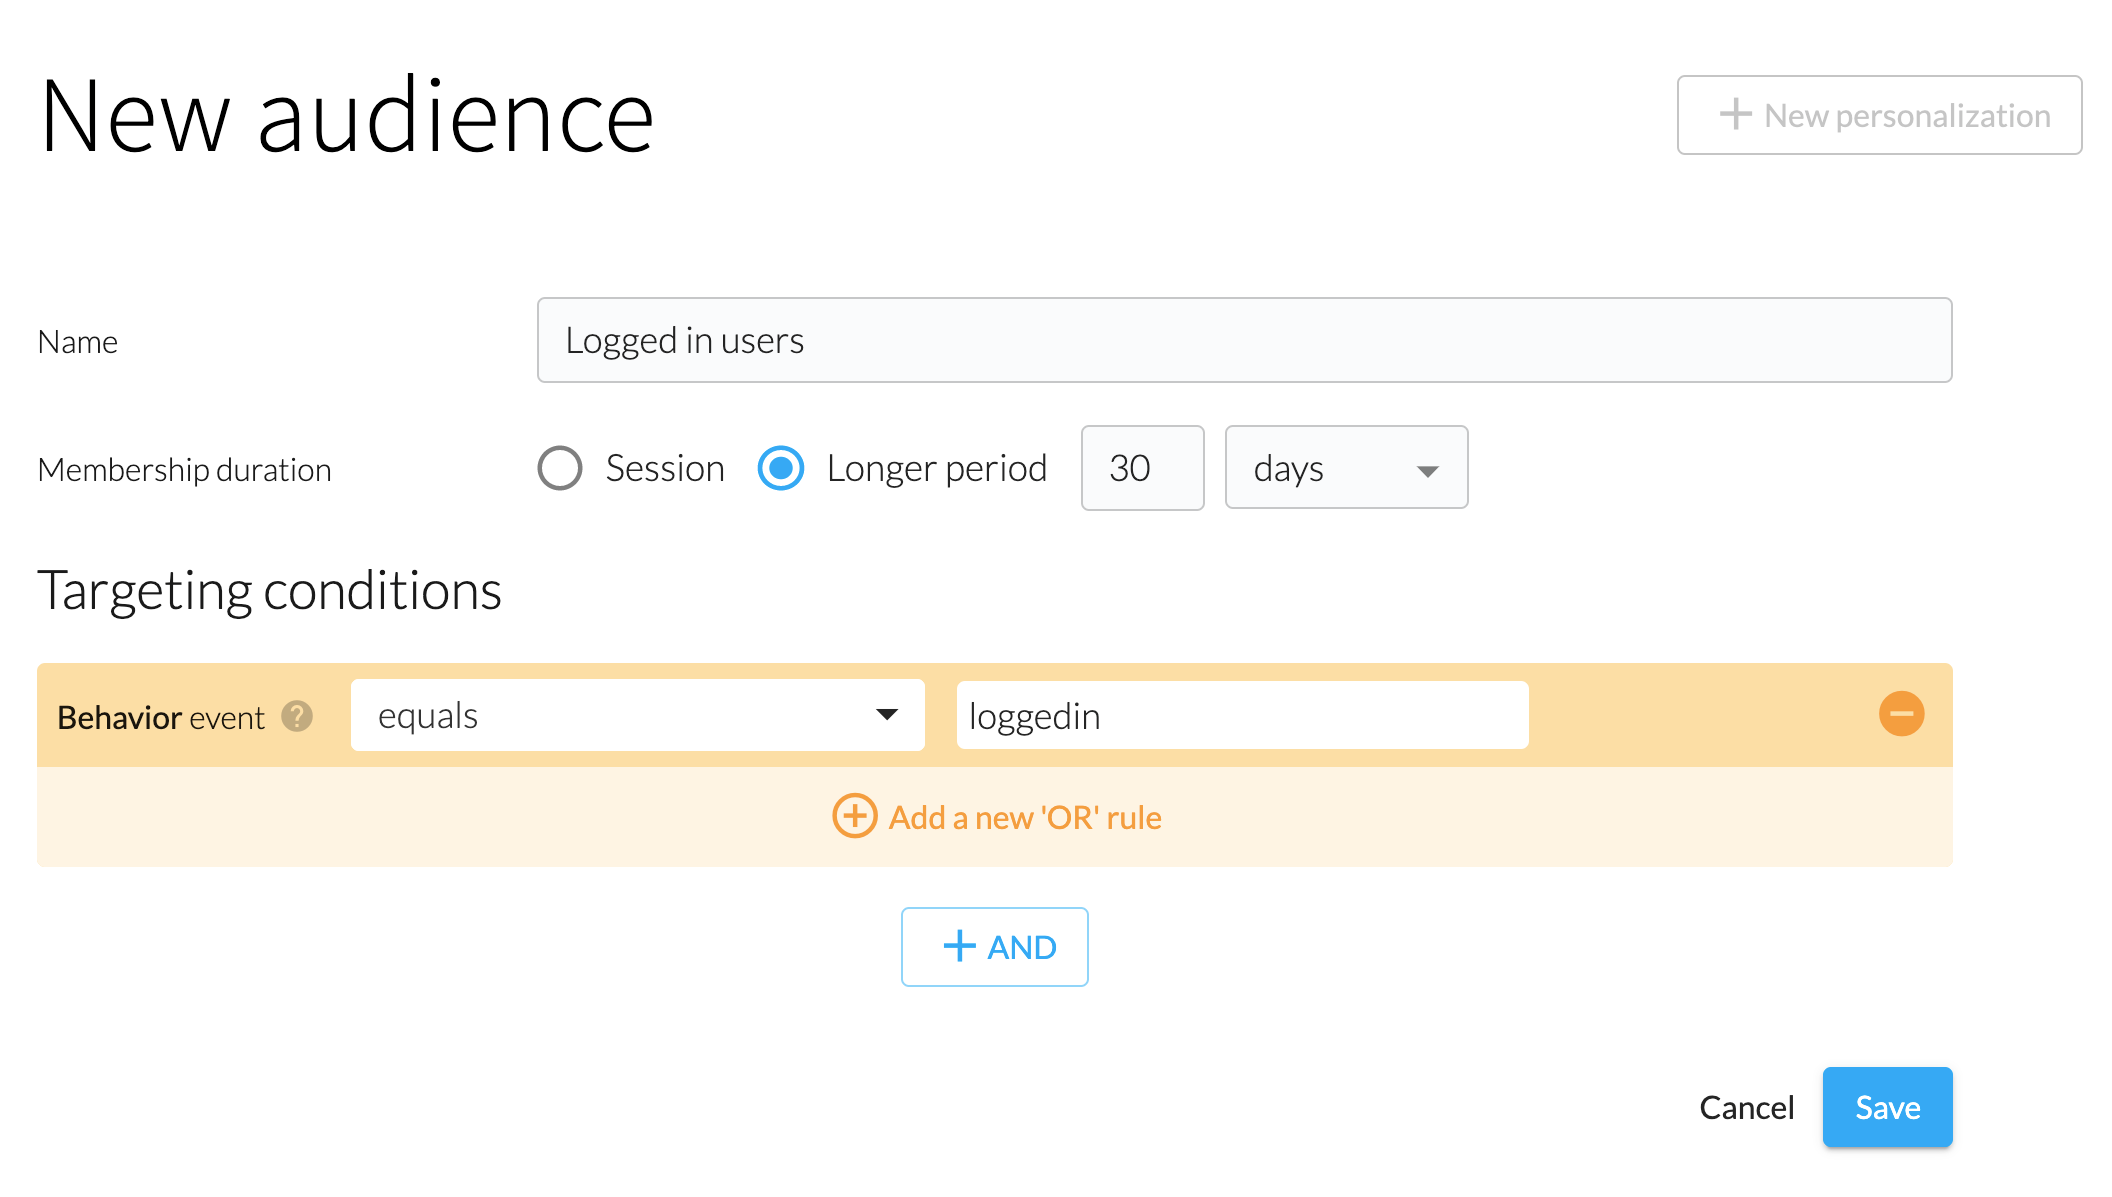 audience-event-loggedin